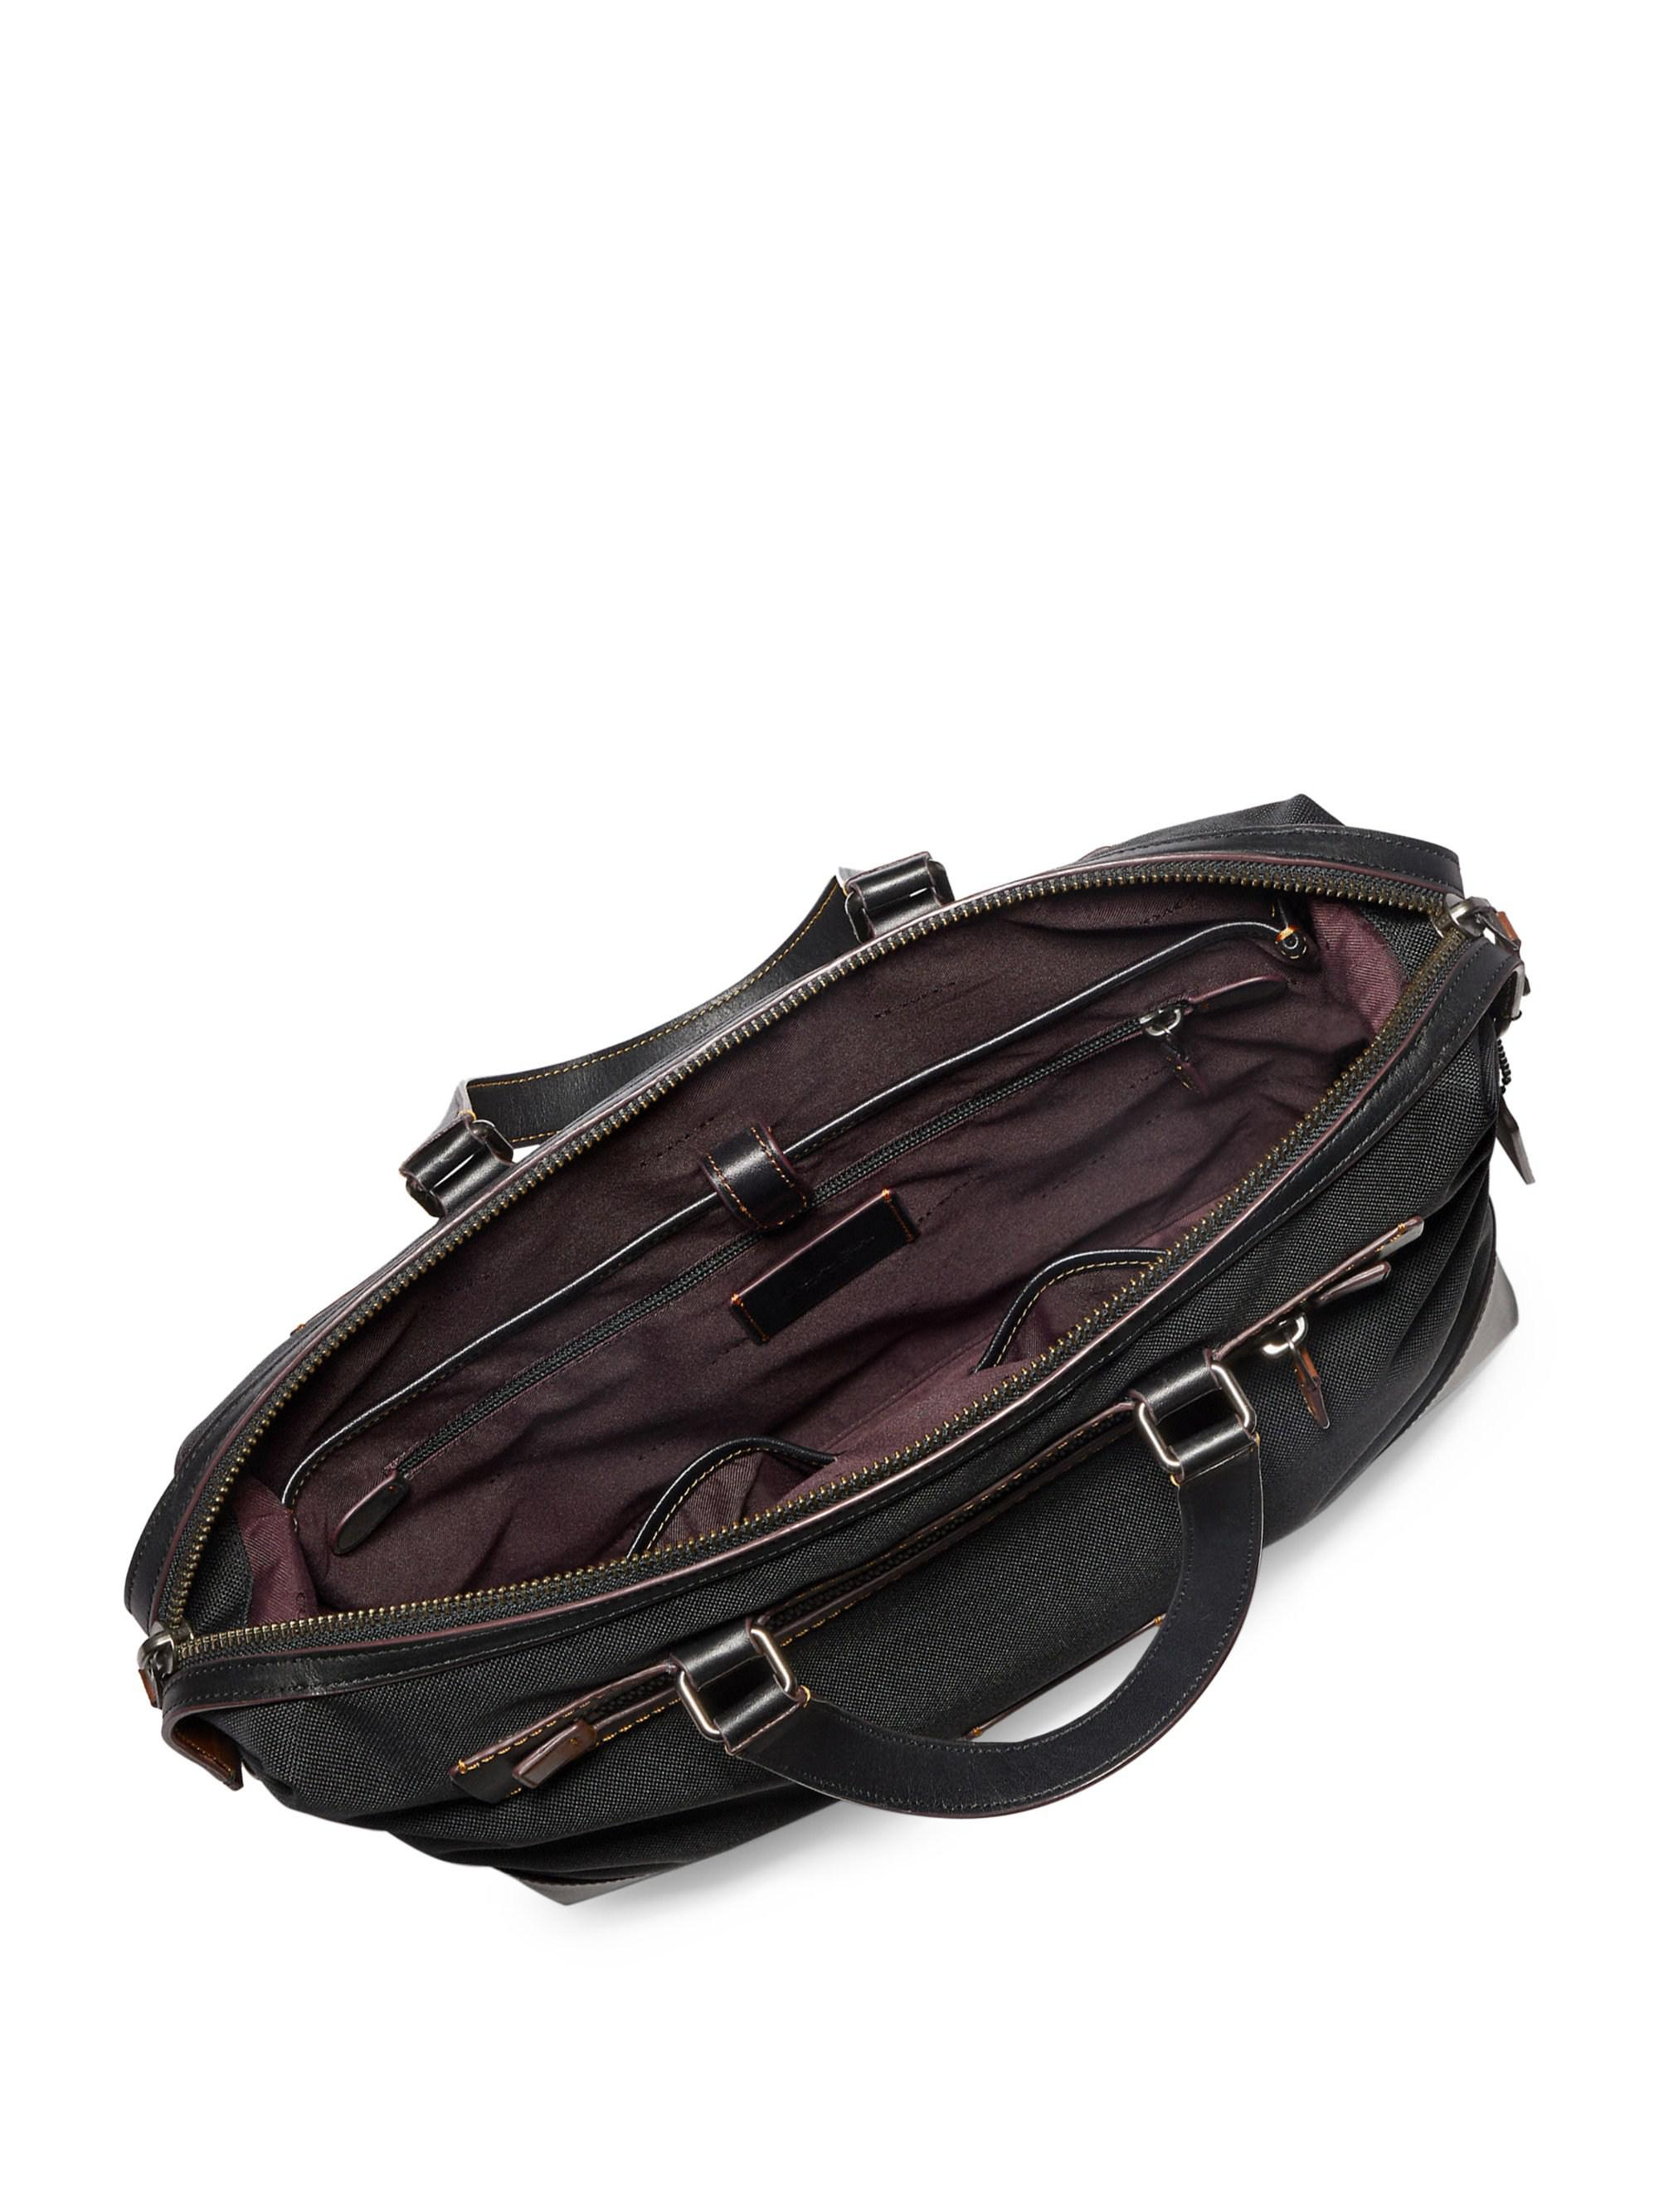 Lyst Men Academy In For Hold Coach Document Bag All Black SqxwzwAR8